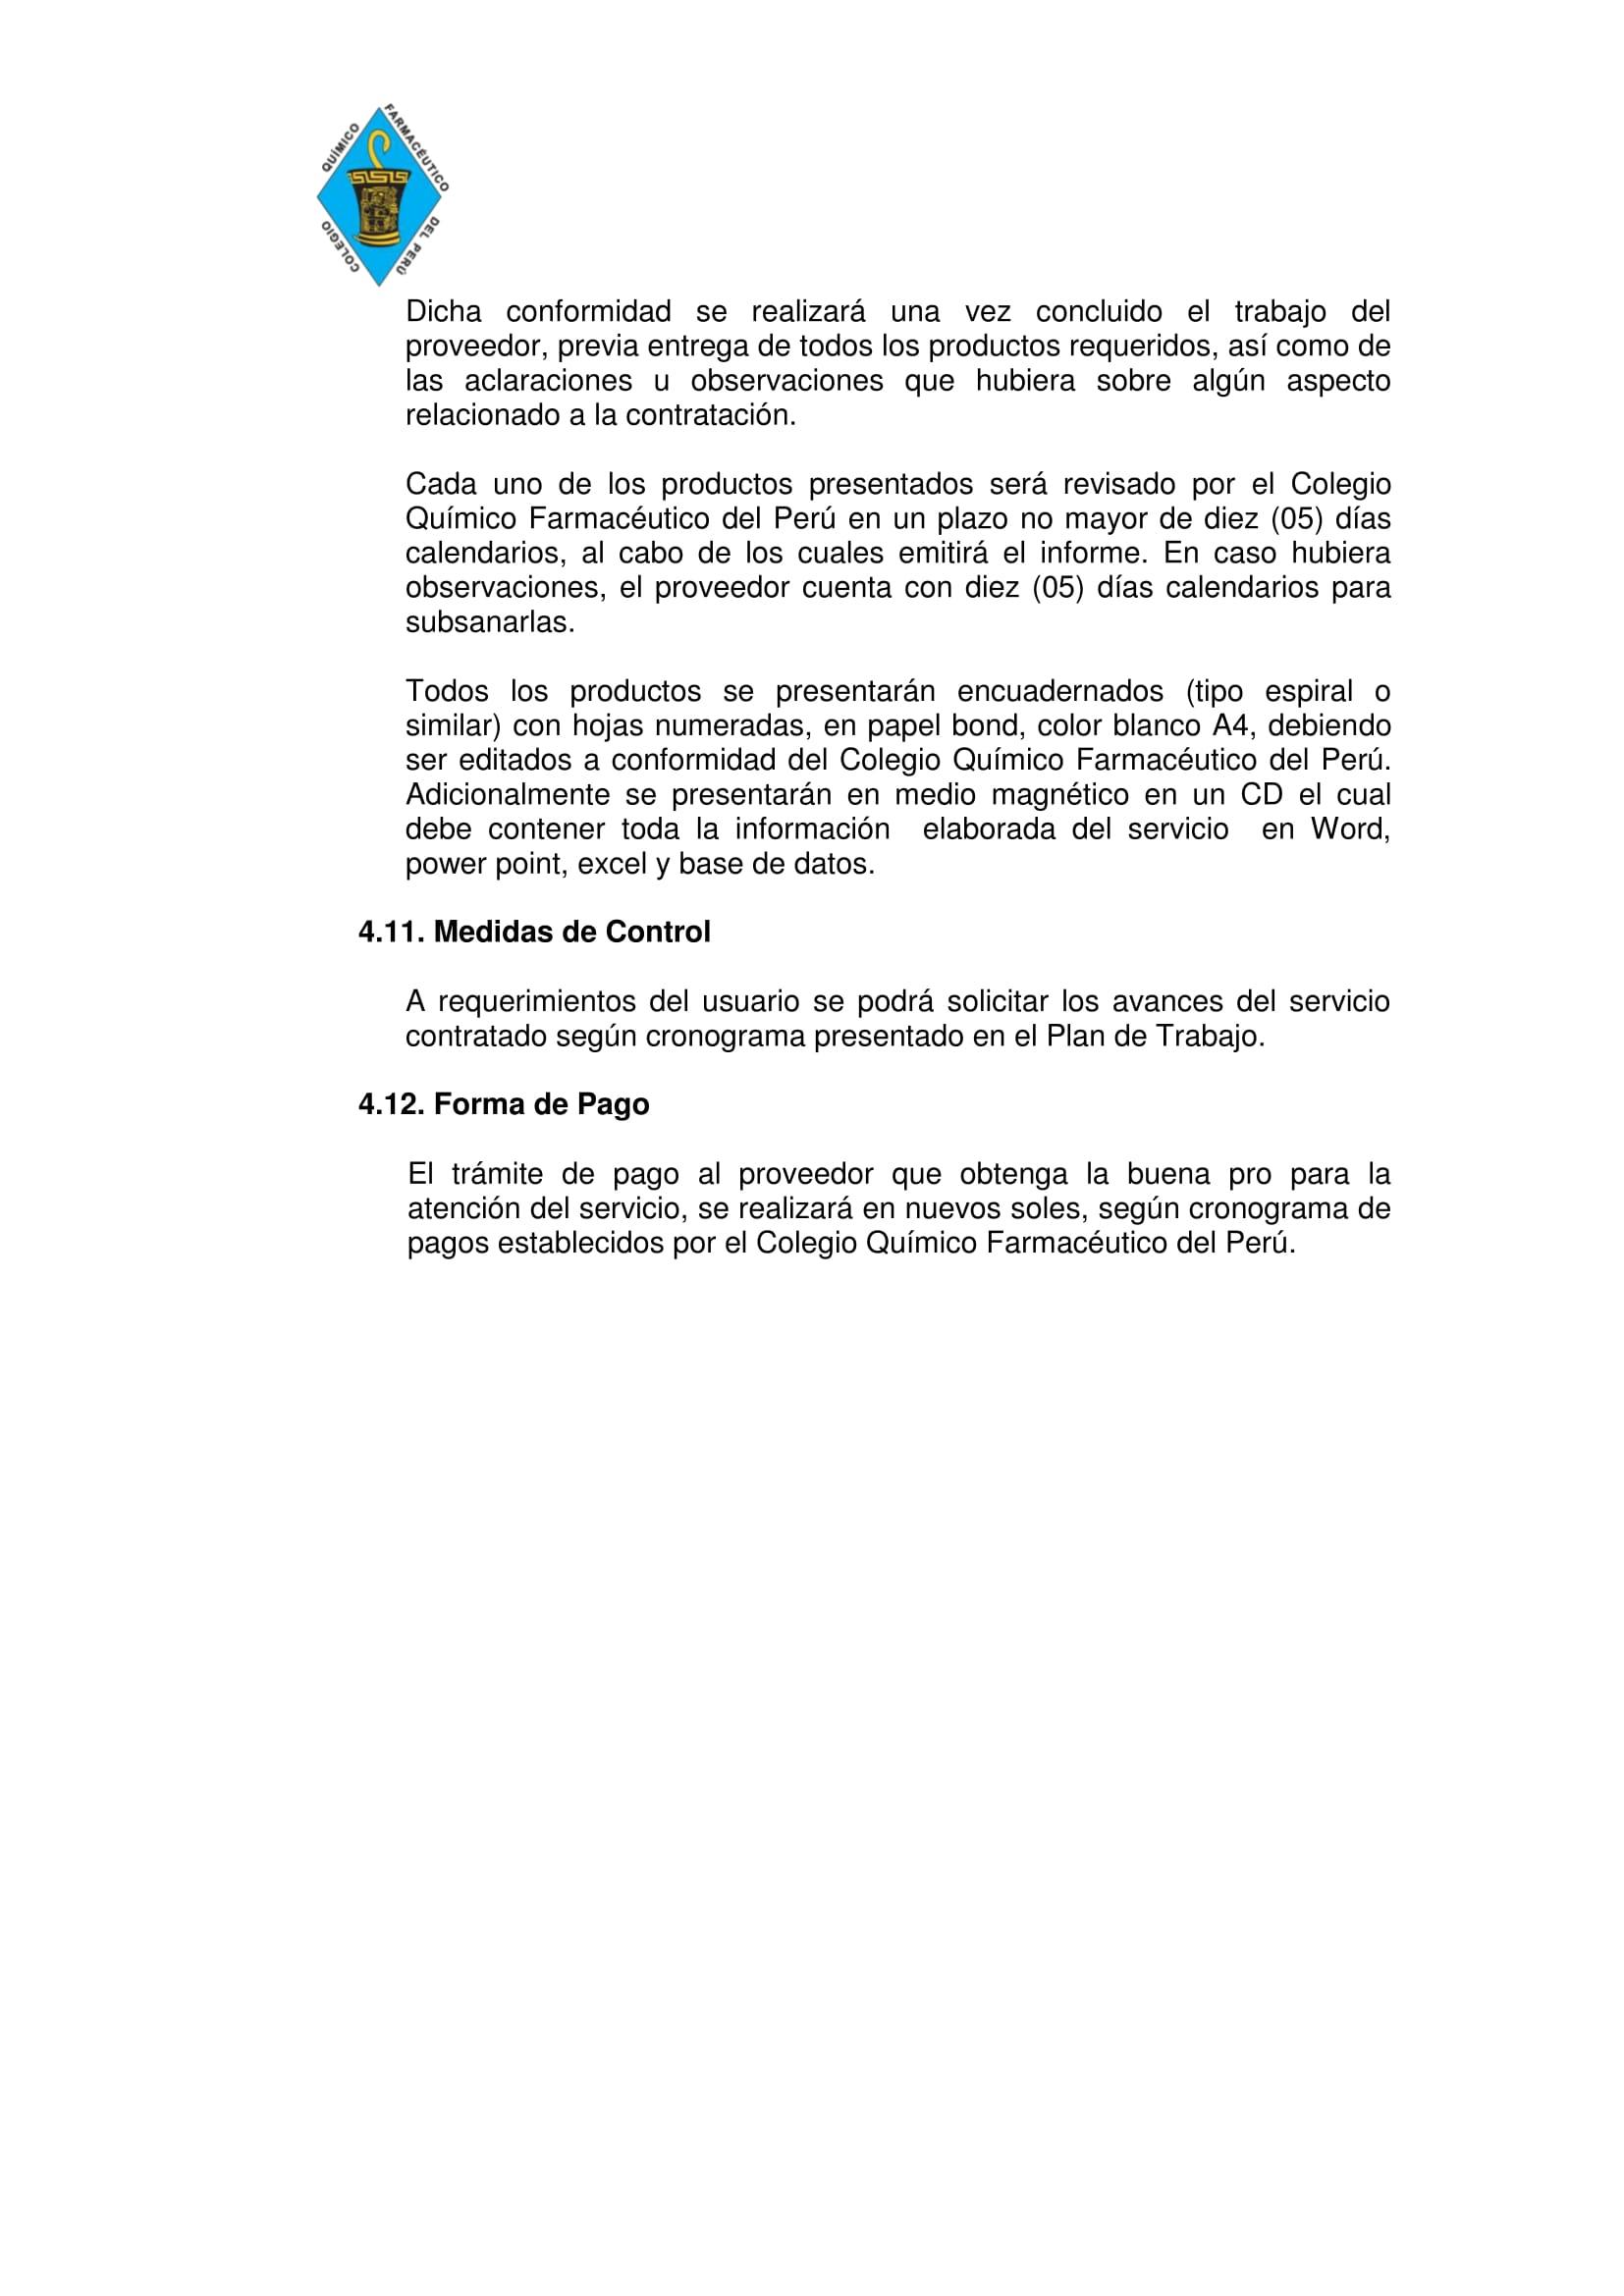 tdr-plan-estrategico-cqfp-5